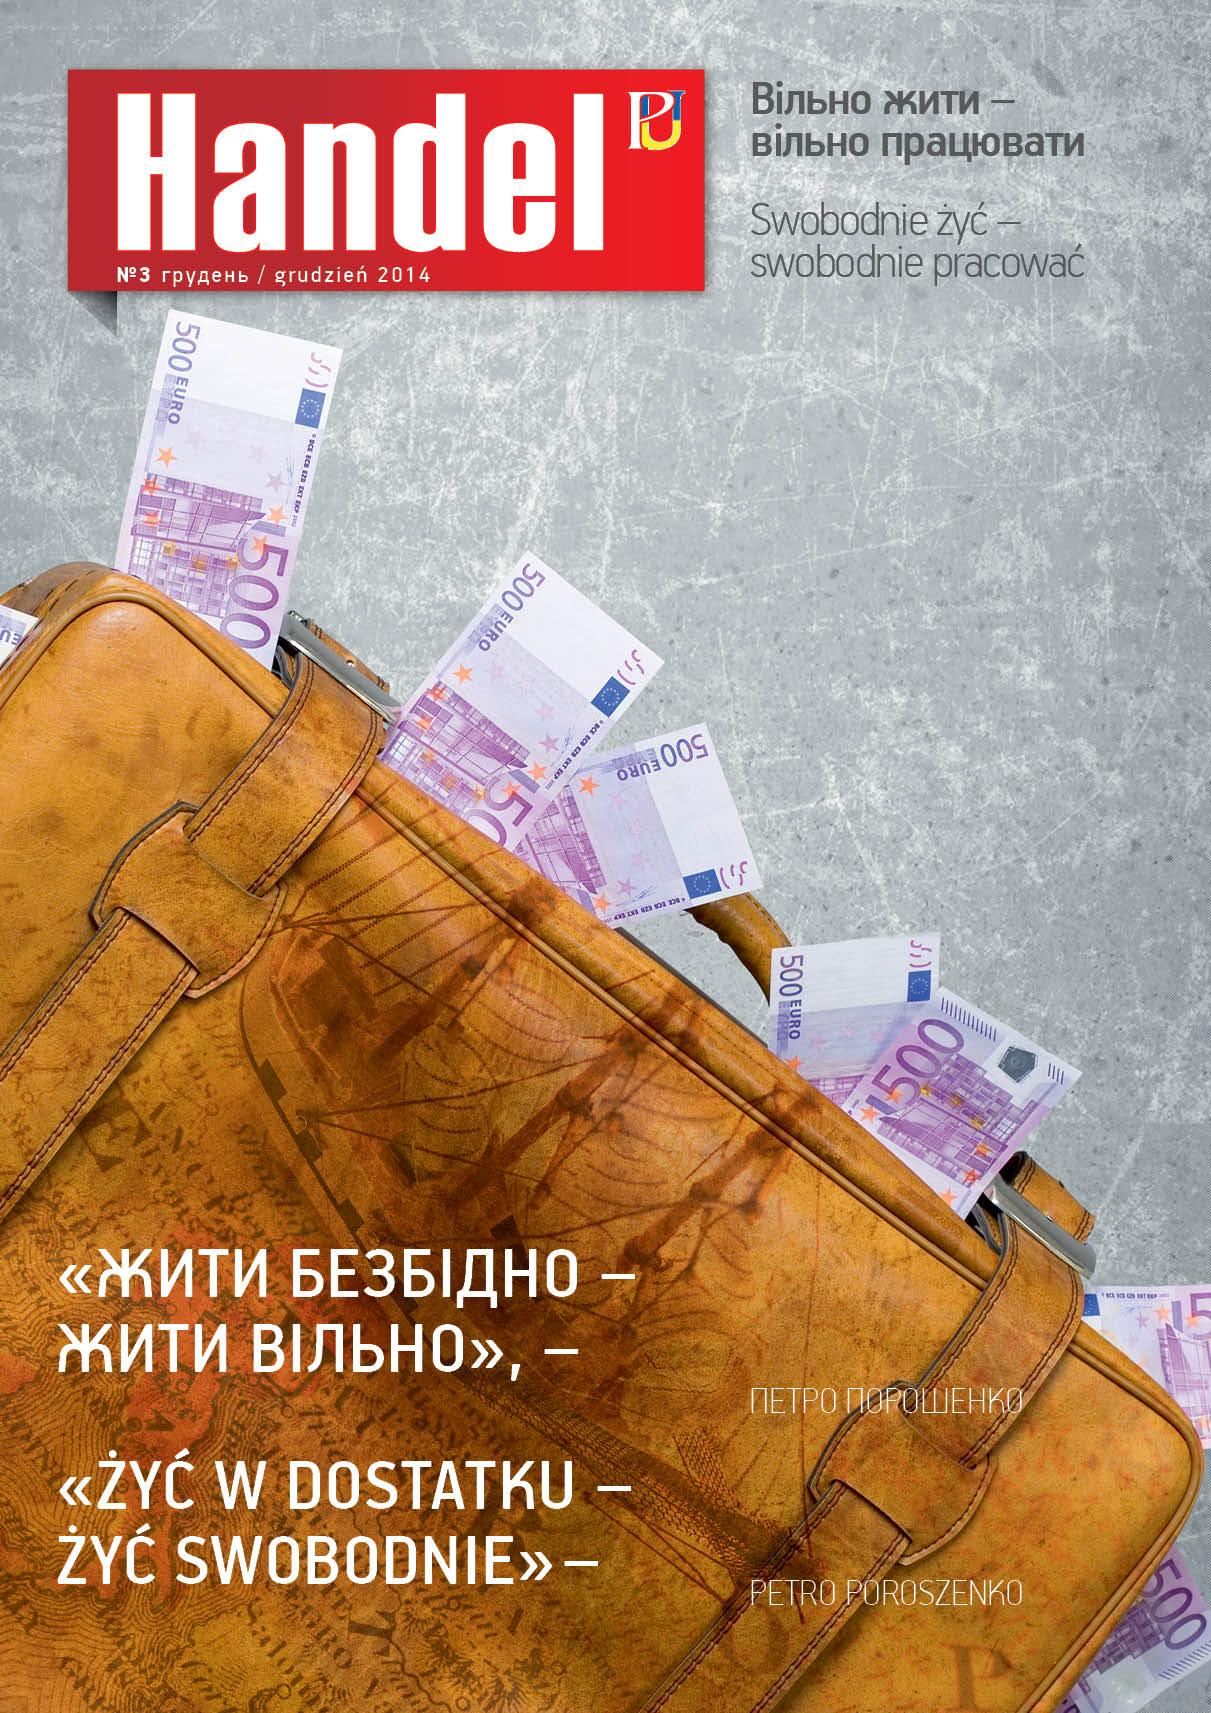 Журнал «Handel», №3, 2014г.